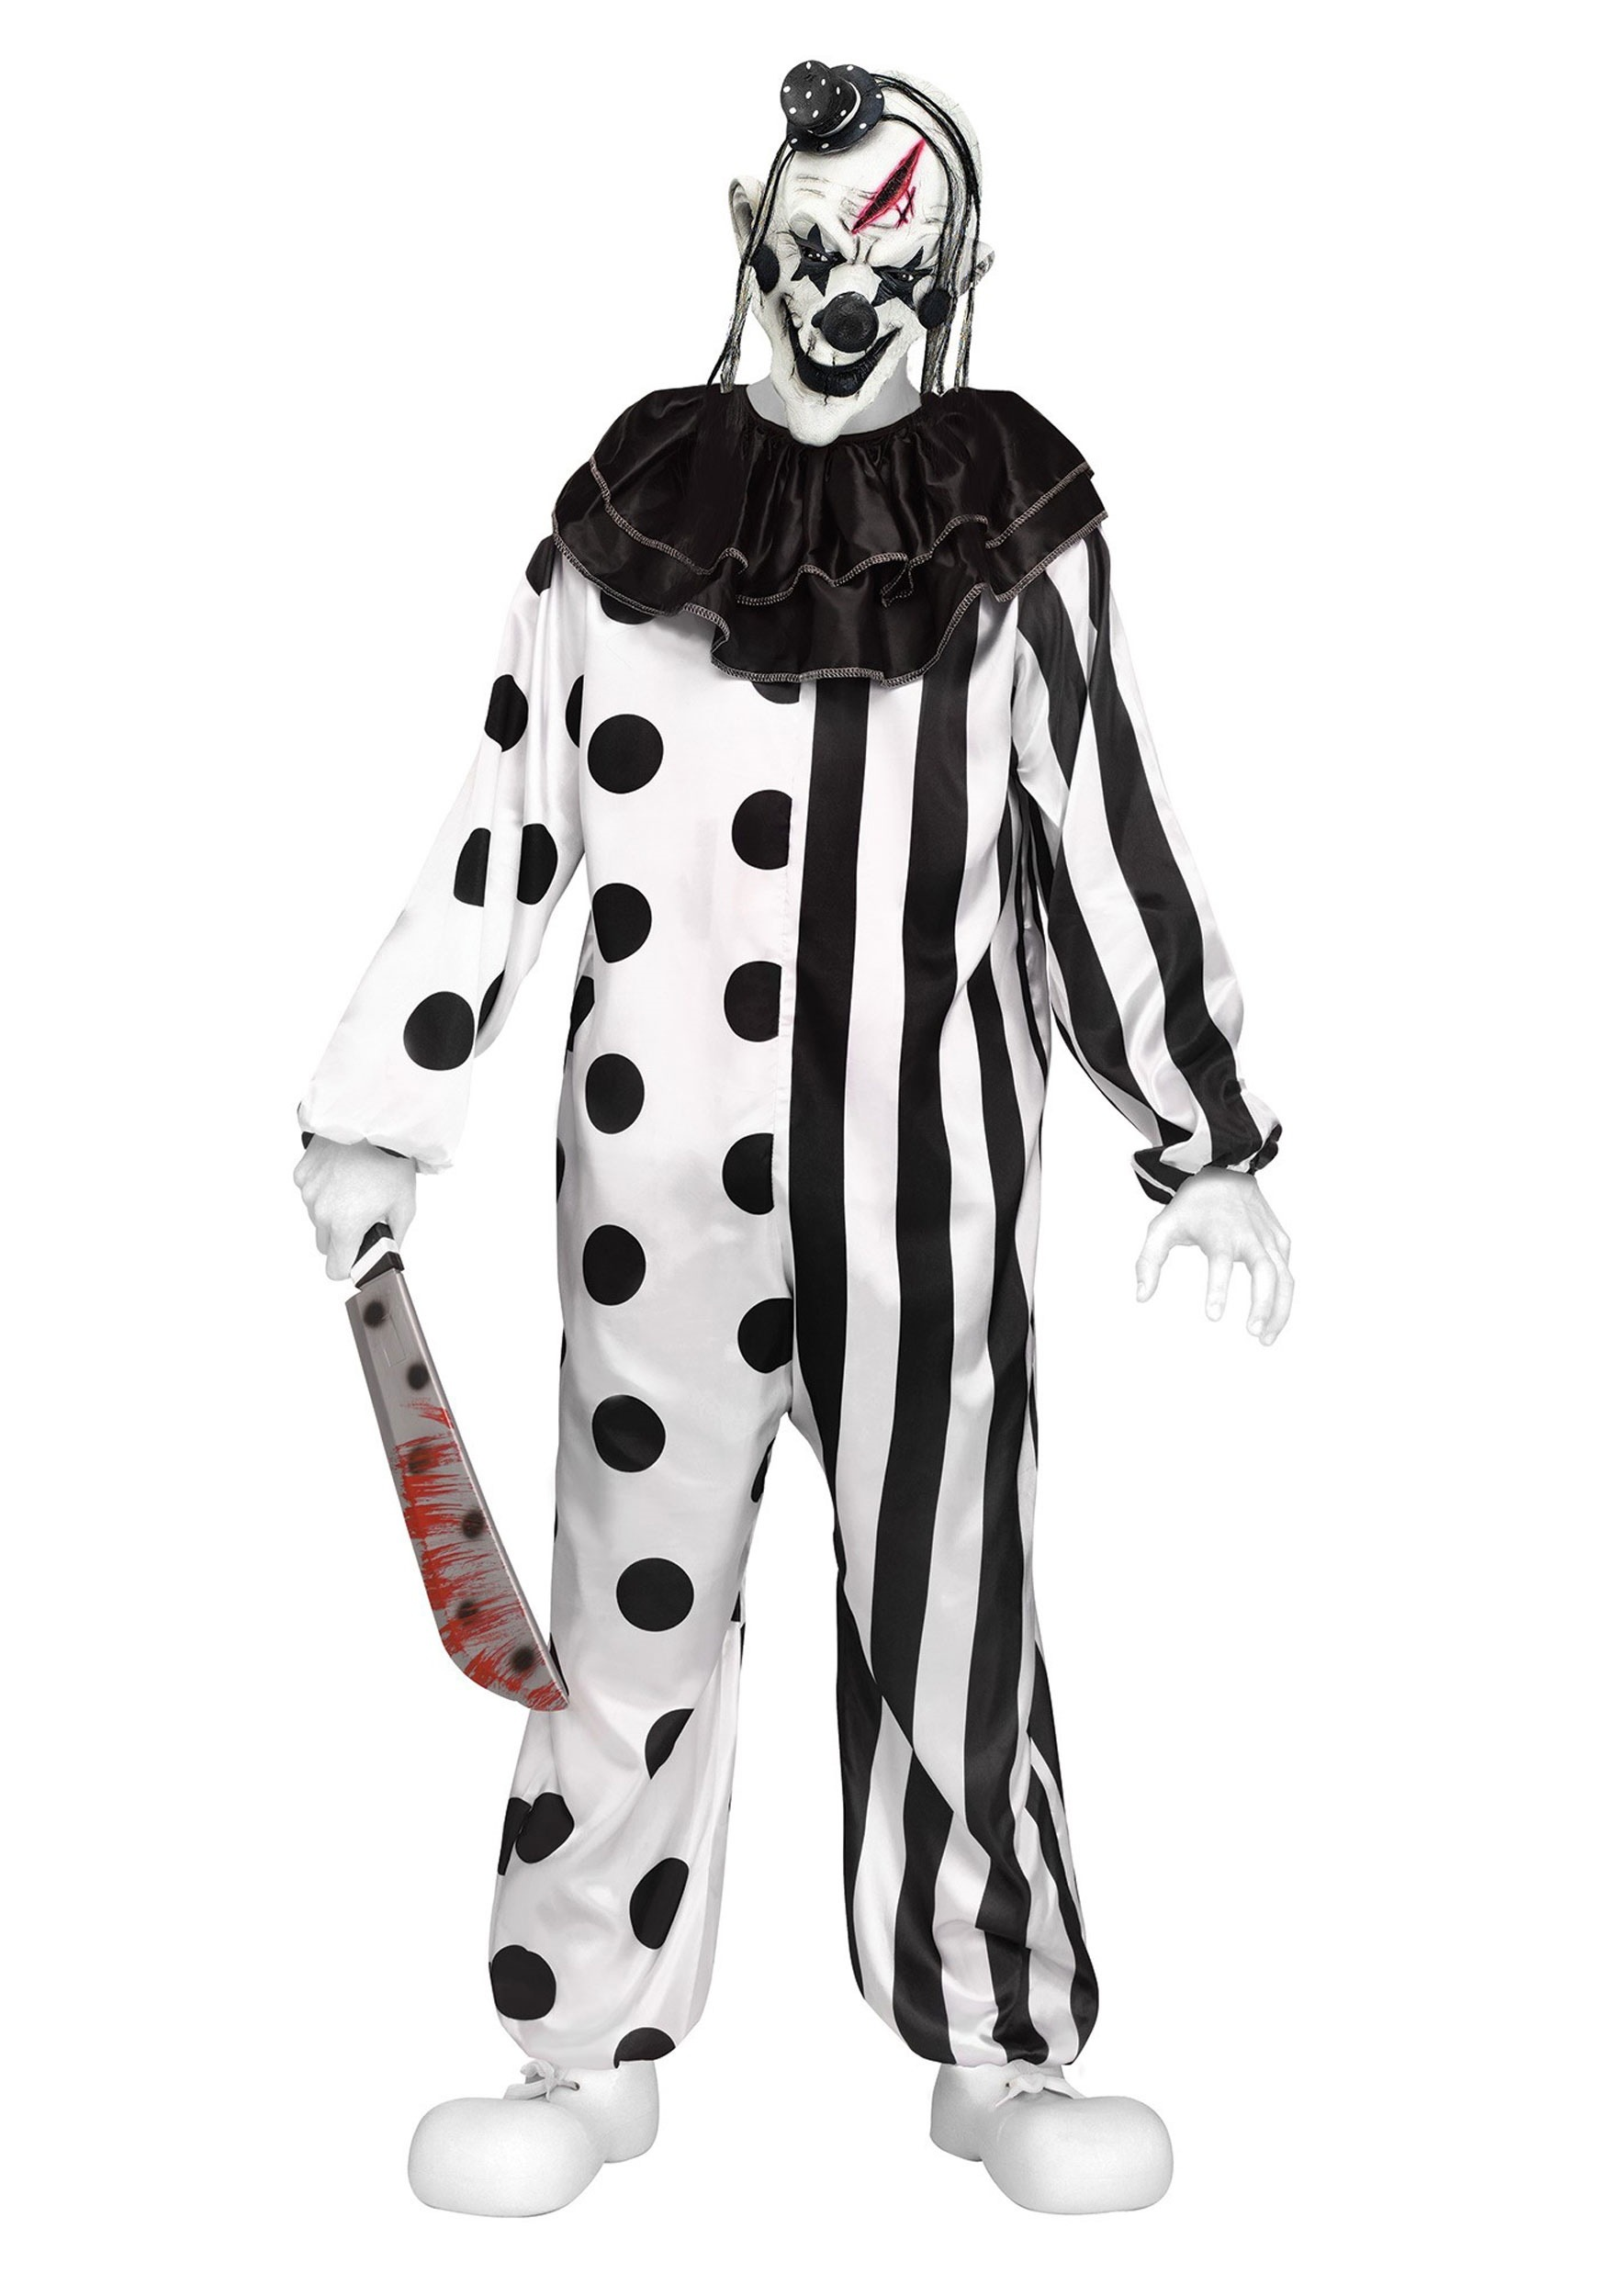 Killer Clown Teen Costume | Scary Halloween Costume